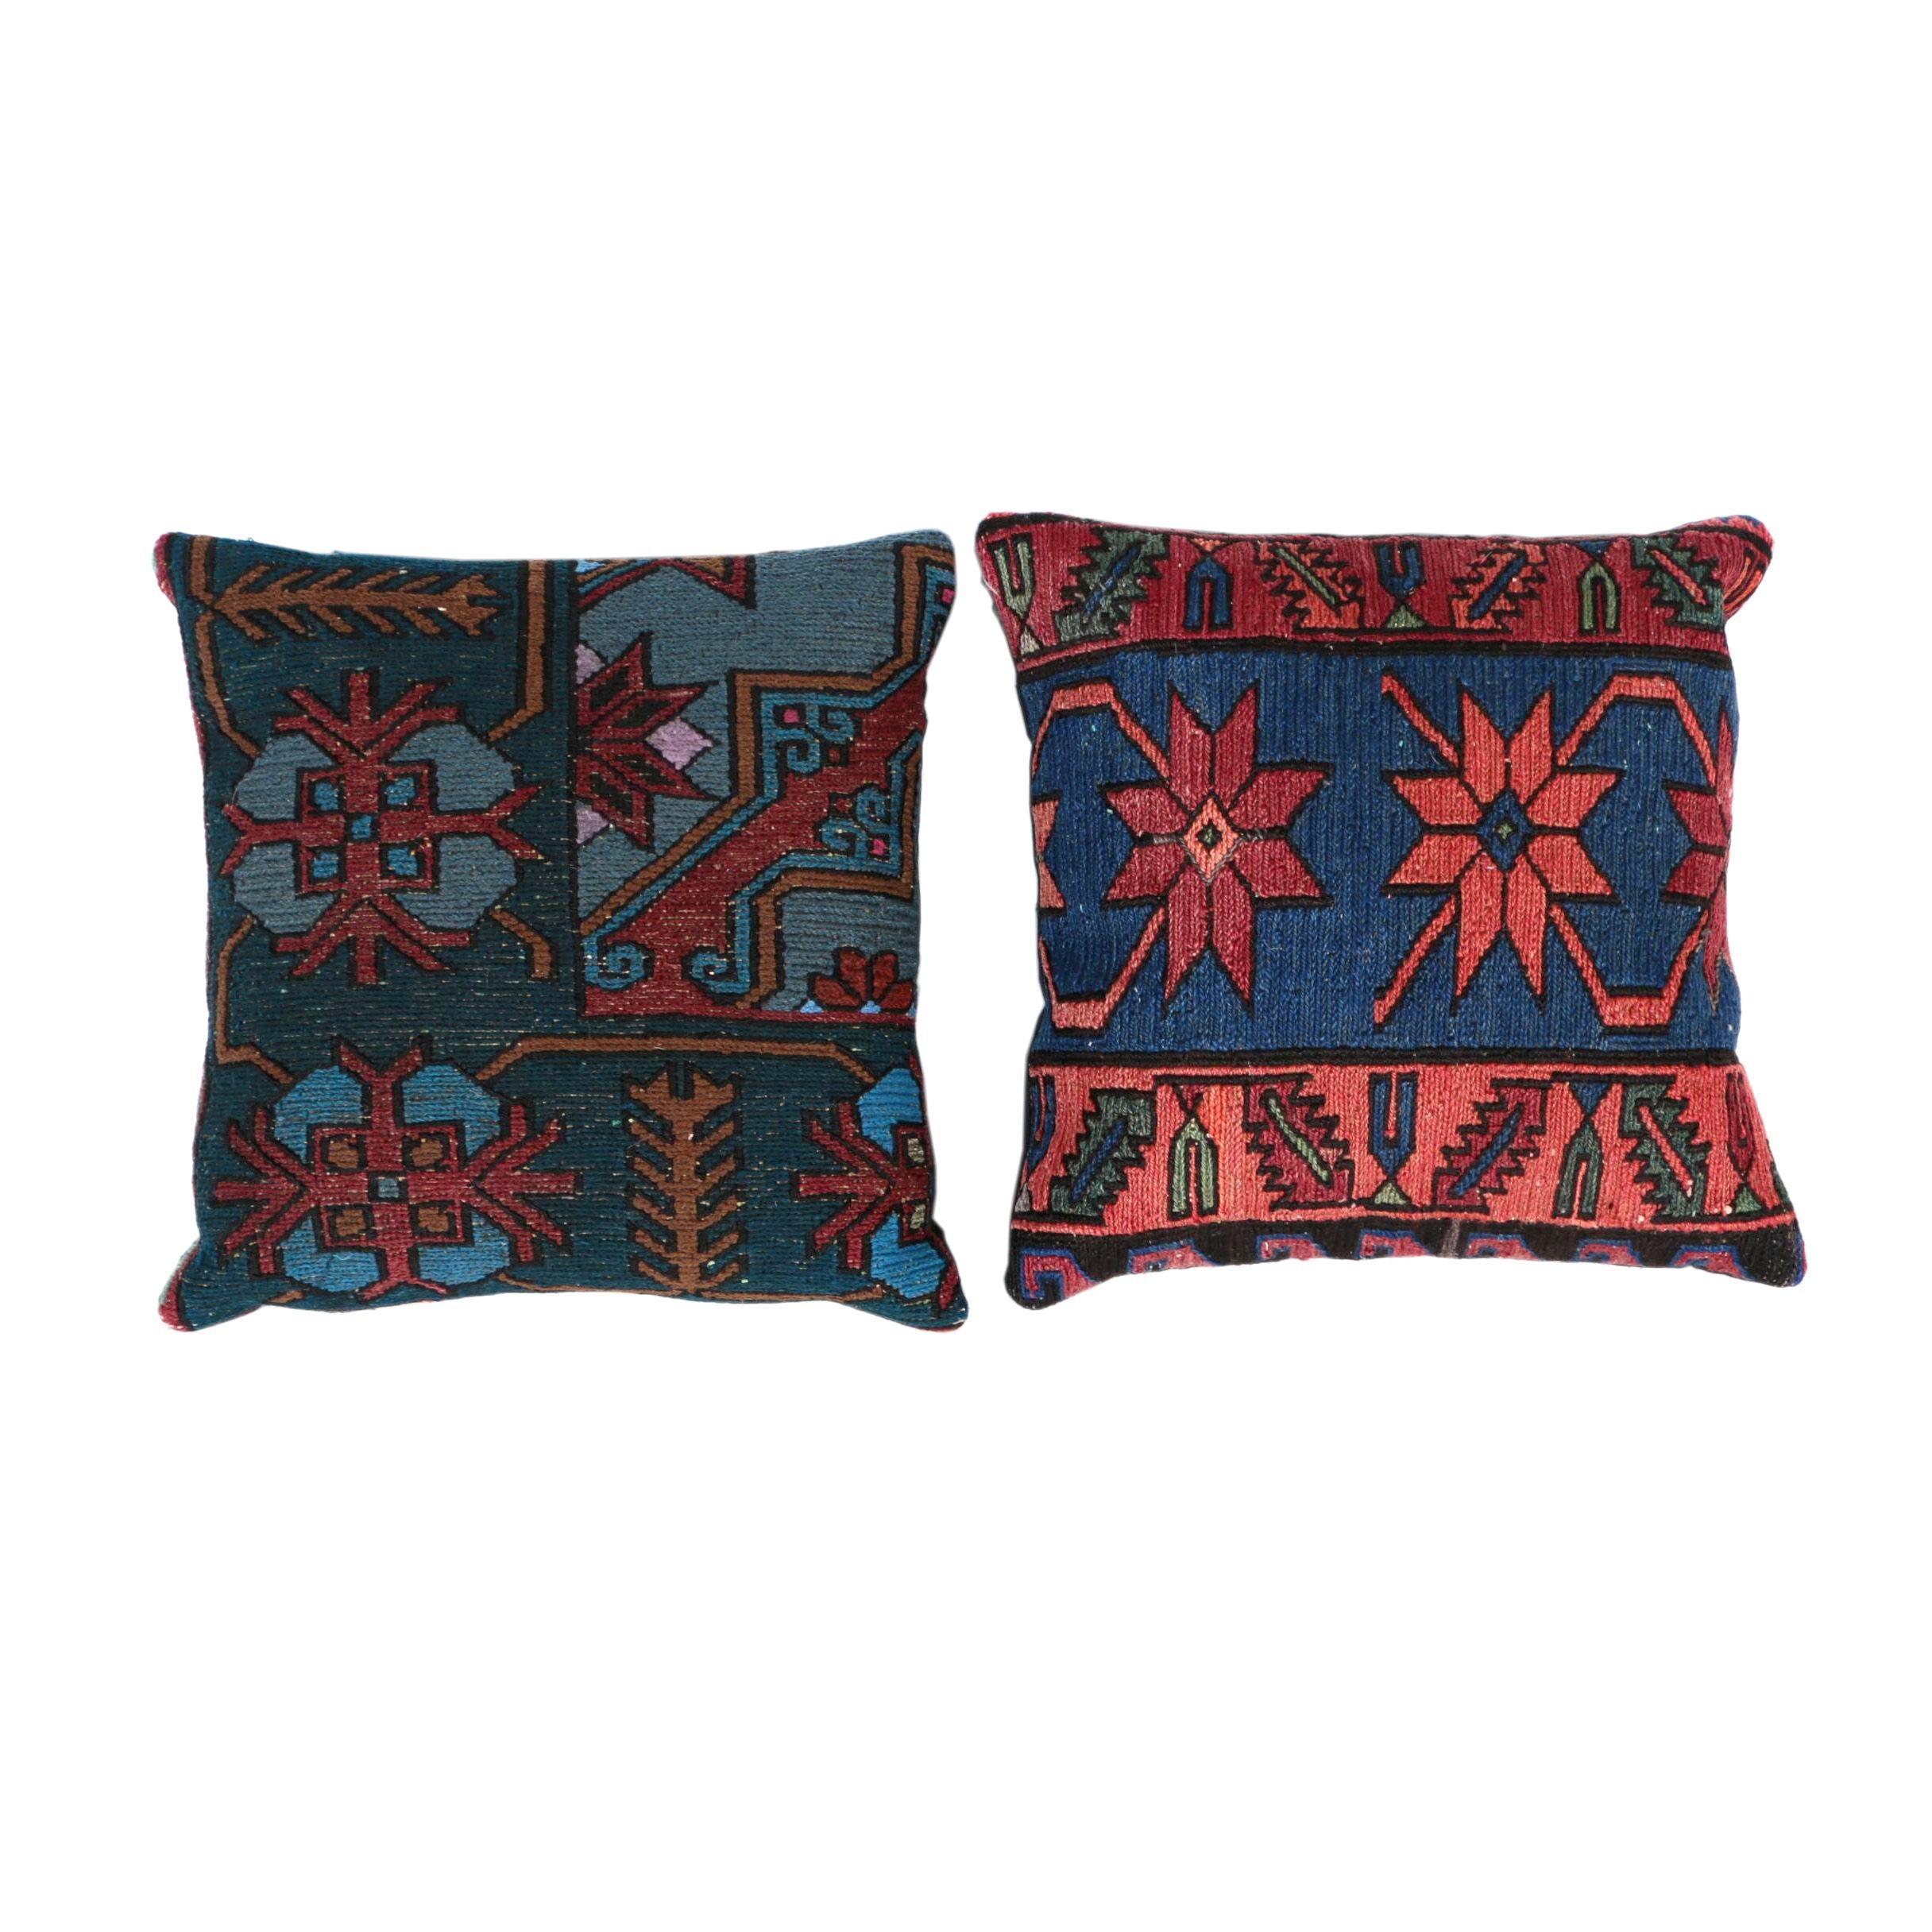 Handwoven Turkish Kilim Throw Pillows